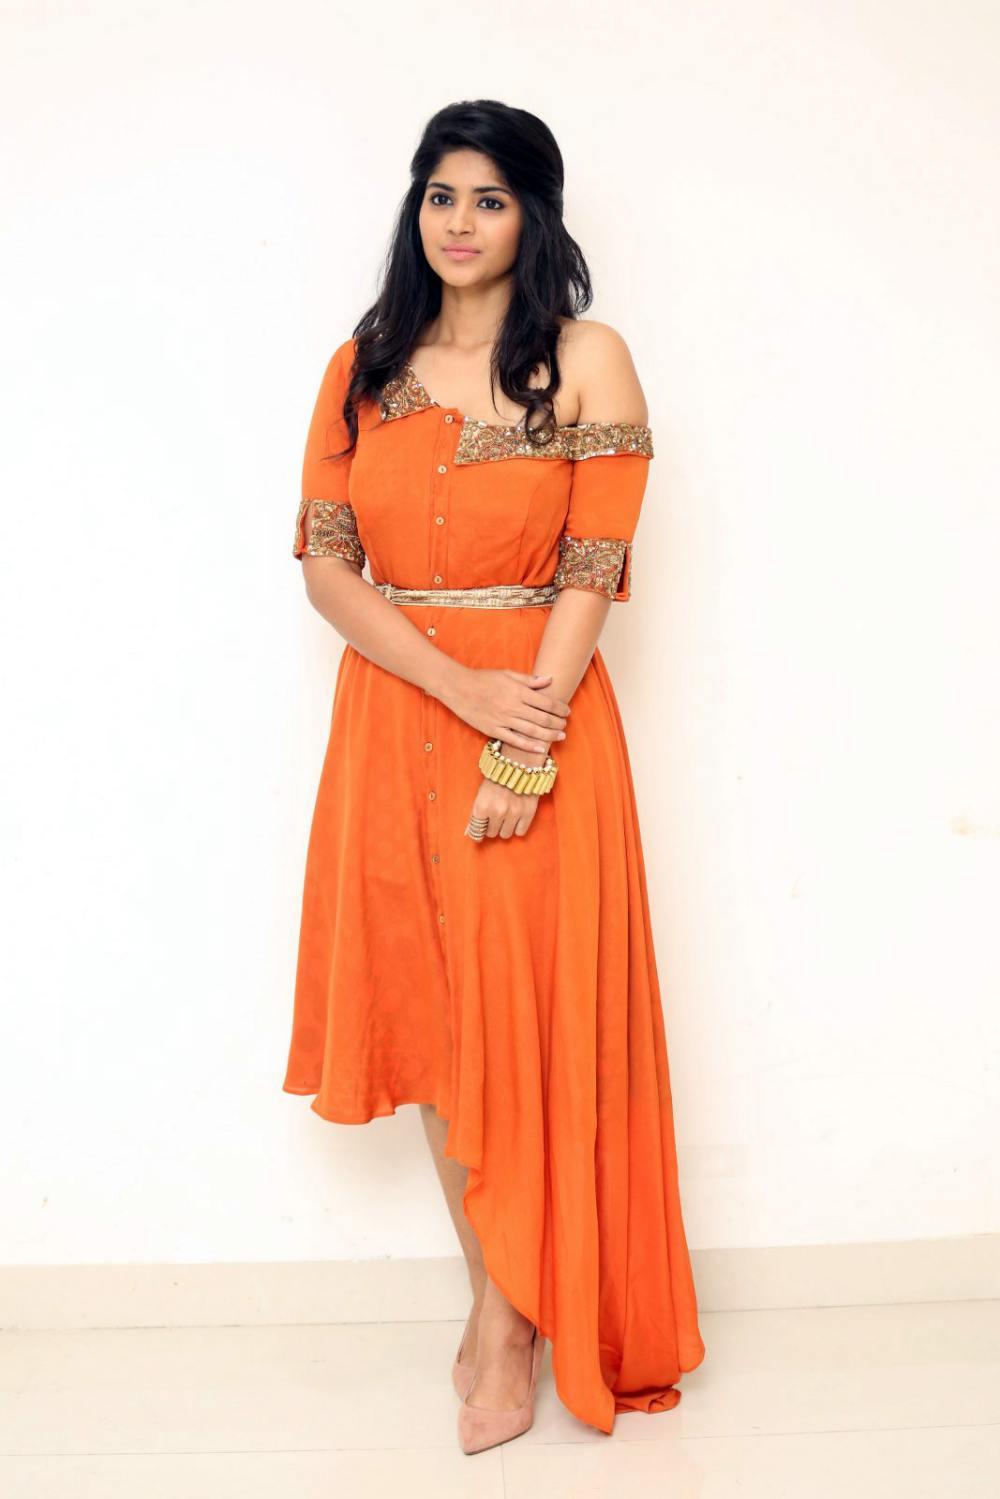 Megha Akash at peta movie audio launch (4)